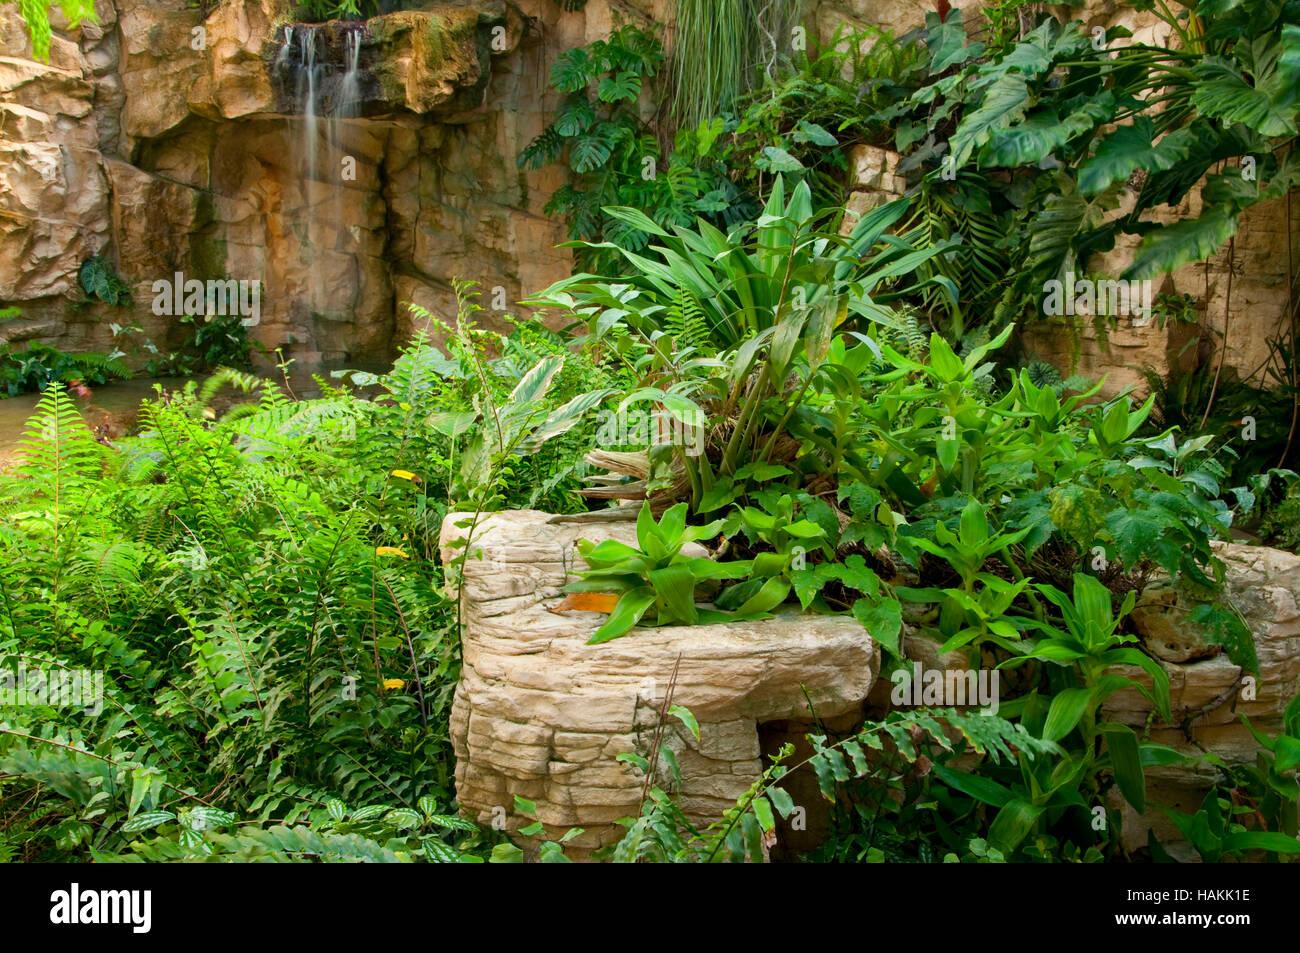 Fern Grotto, San Antonio Botanical Garden, San Antonio, Texas